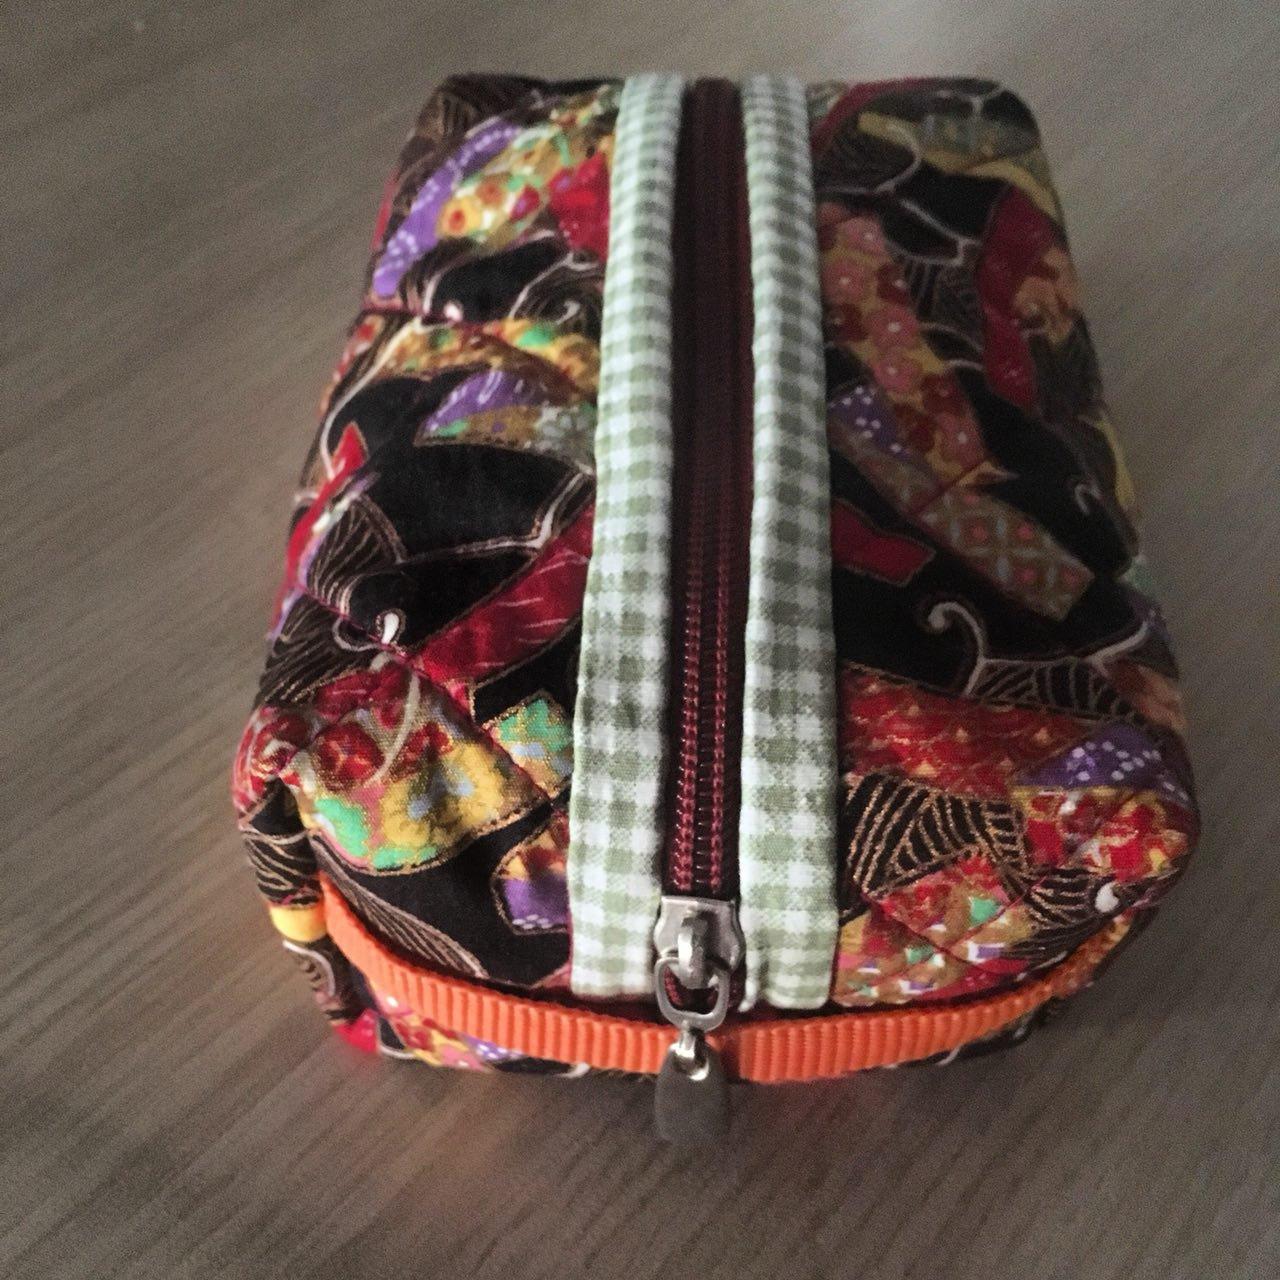 کیف لوازم آرایش